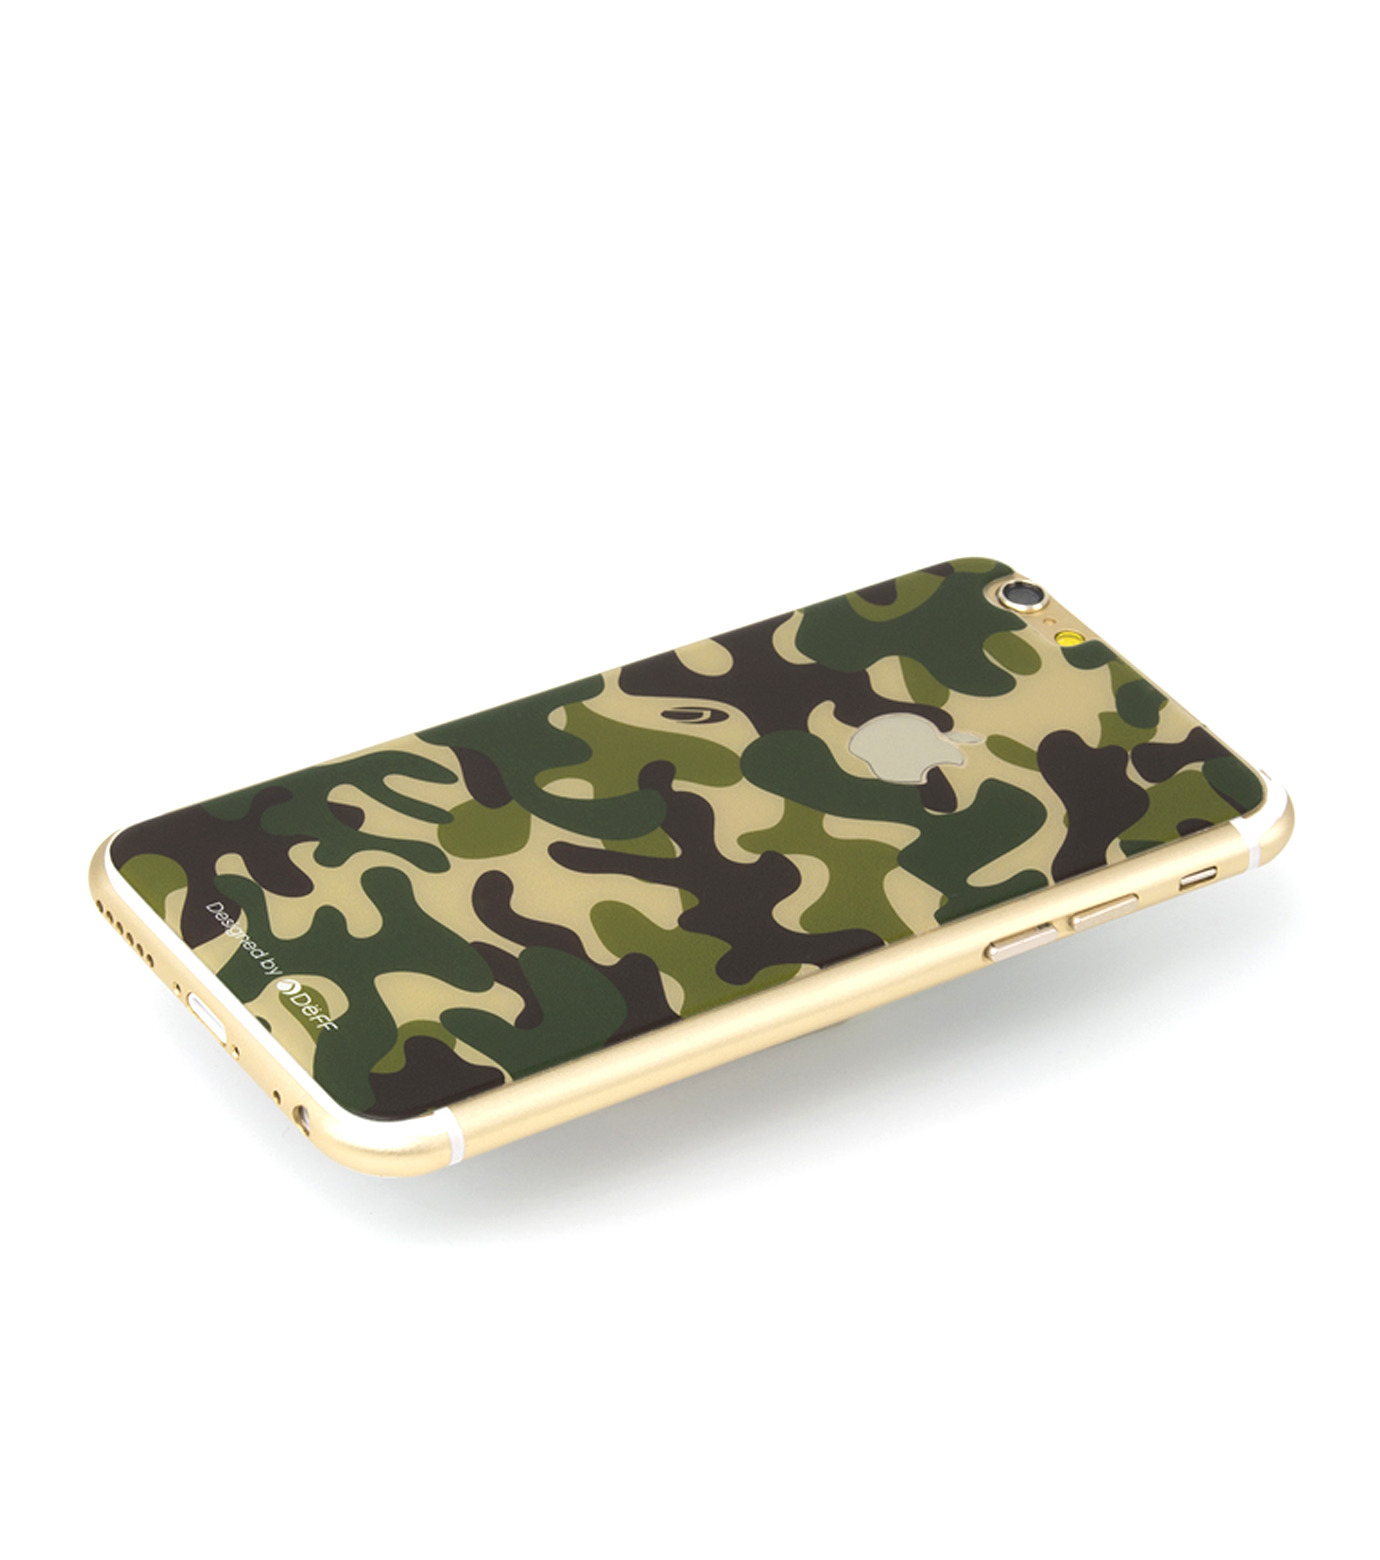 DeFF(ディーフ)のIP6+ Glass Woodland-KHAKI(ケースiphone6plus/6splus/case iphone6plus/6splus)-IP6PG3BCFGN-24 拡大詳細画像1